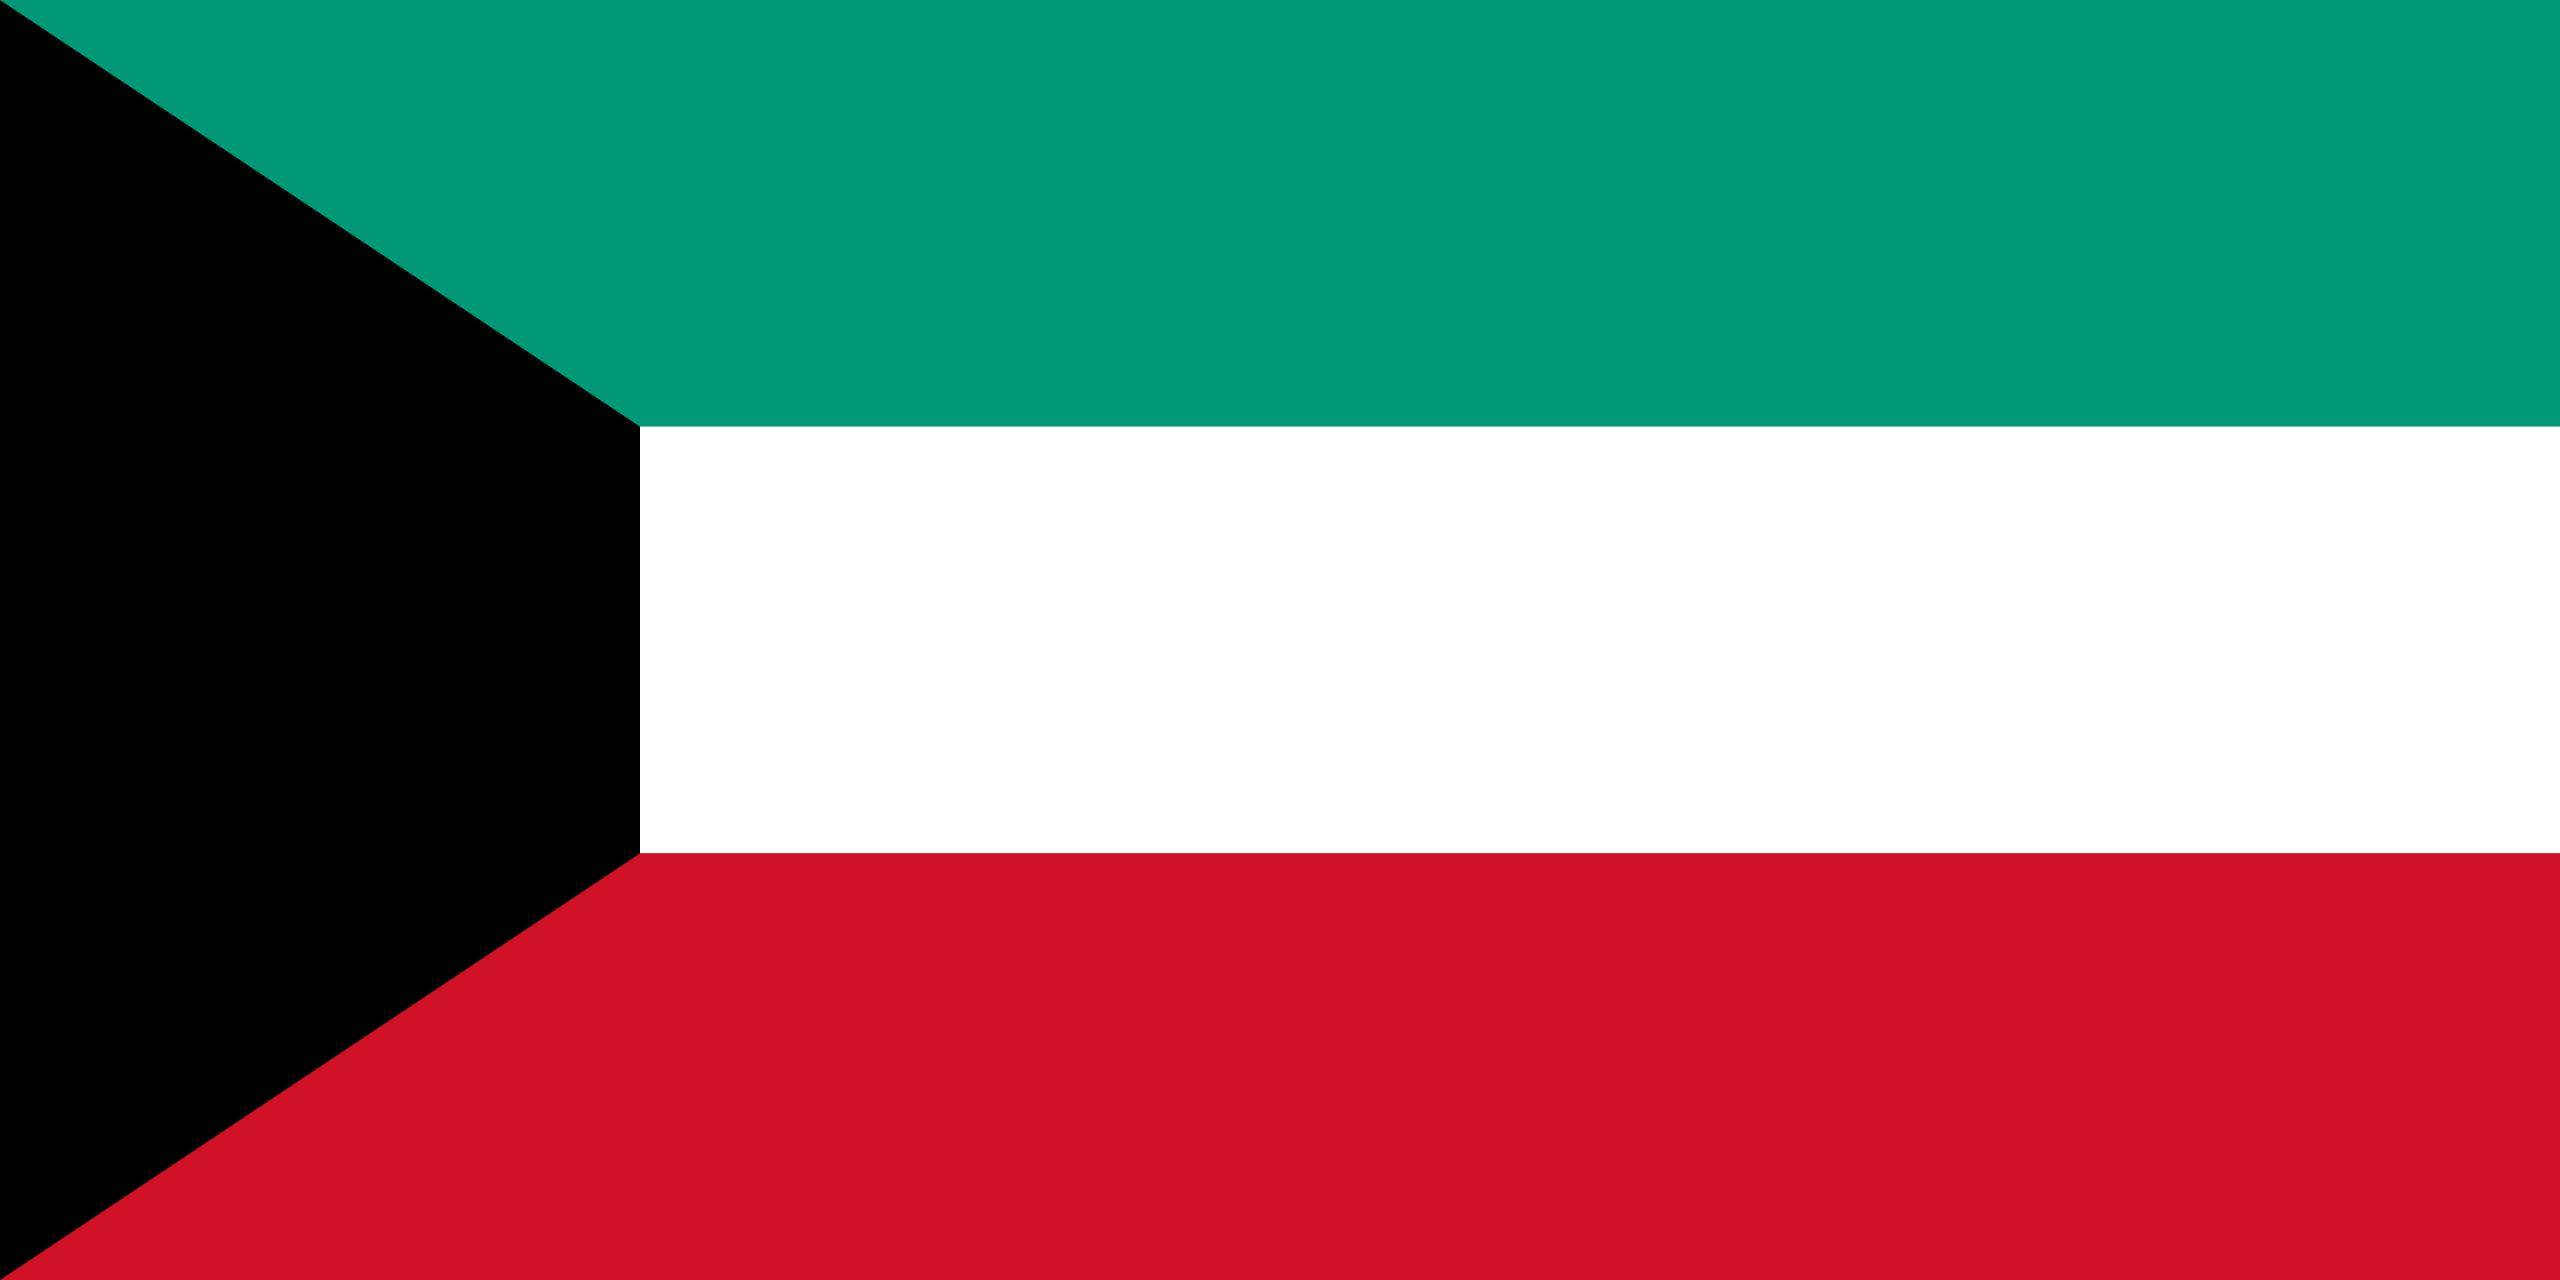 kuwait, 国家, 会徽, 徽标, 符号 - 高清壁纸 - 教授-falken.com